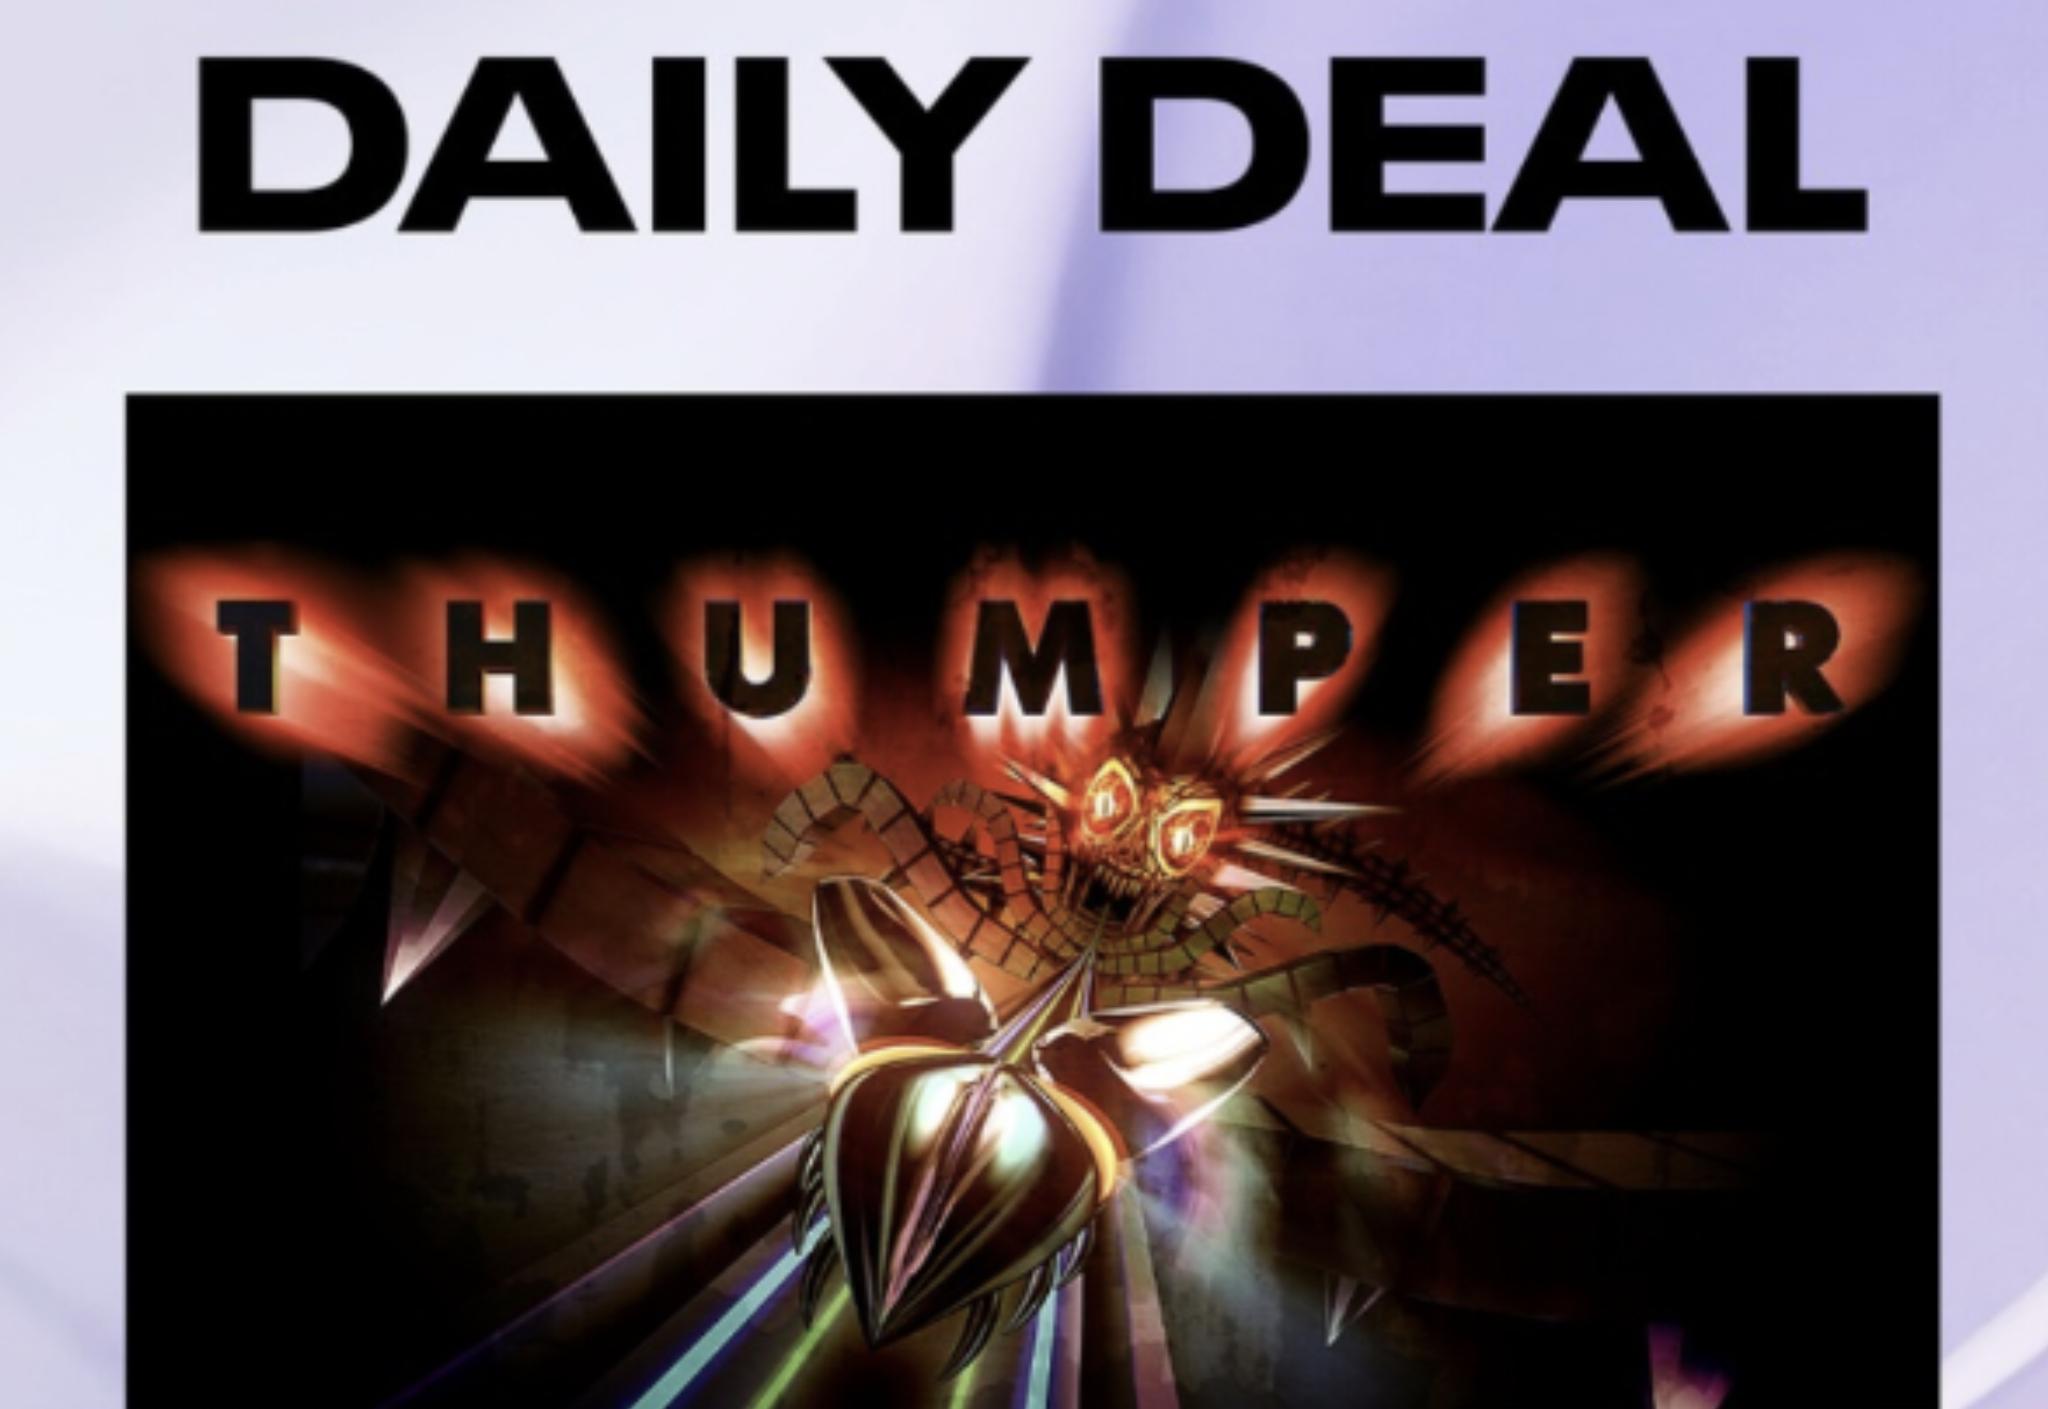 Oculus VR Daily Deal - Thumper £8.99 @ Oculus